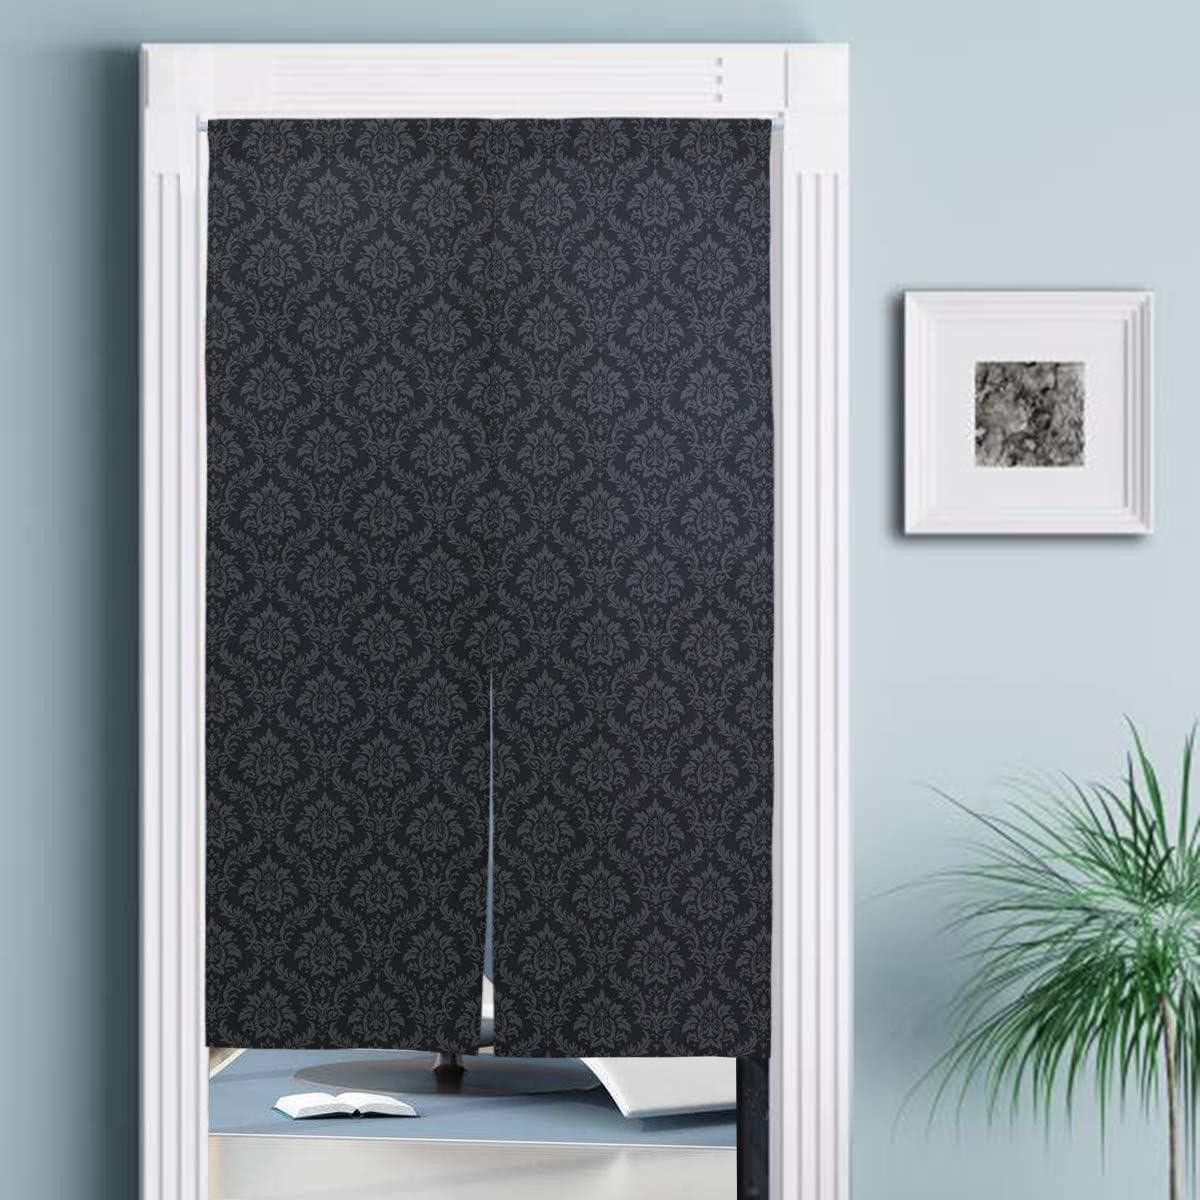 Doublecw Black And Grey Home Japanese Noren Doorway Curtain Kitchen Bedroom Bathroom Tapestry 34 Width X 56 3 Long Home Kitchen